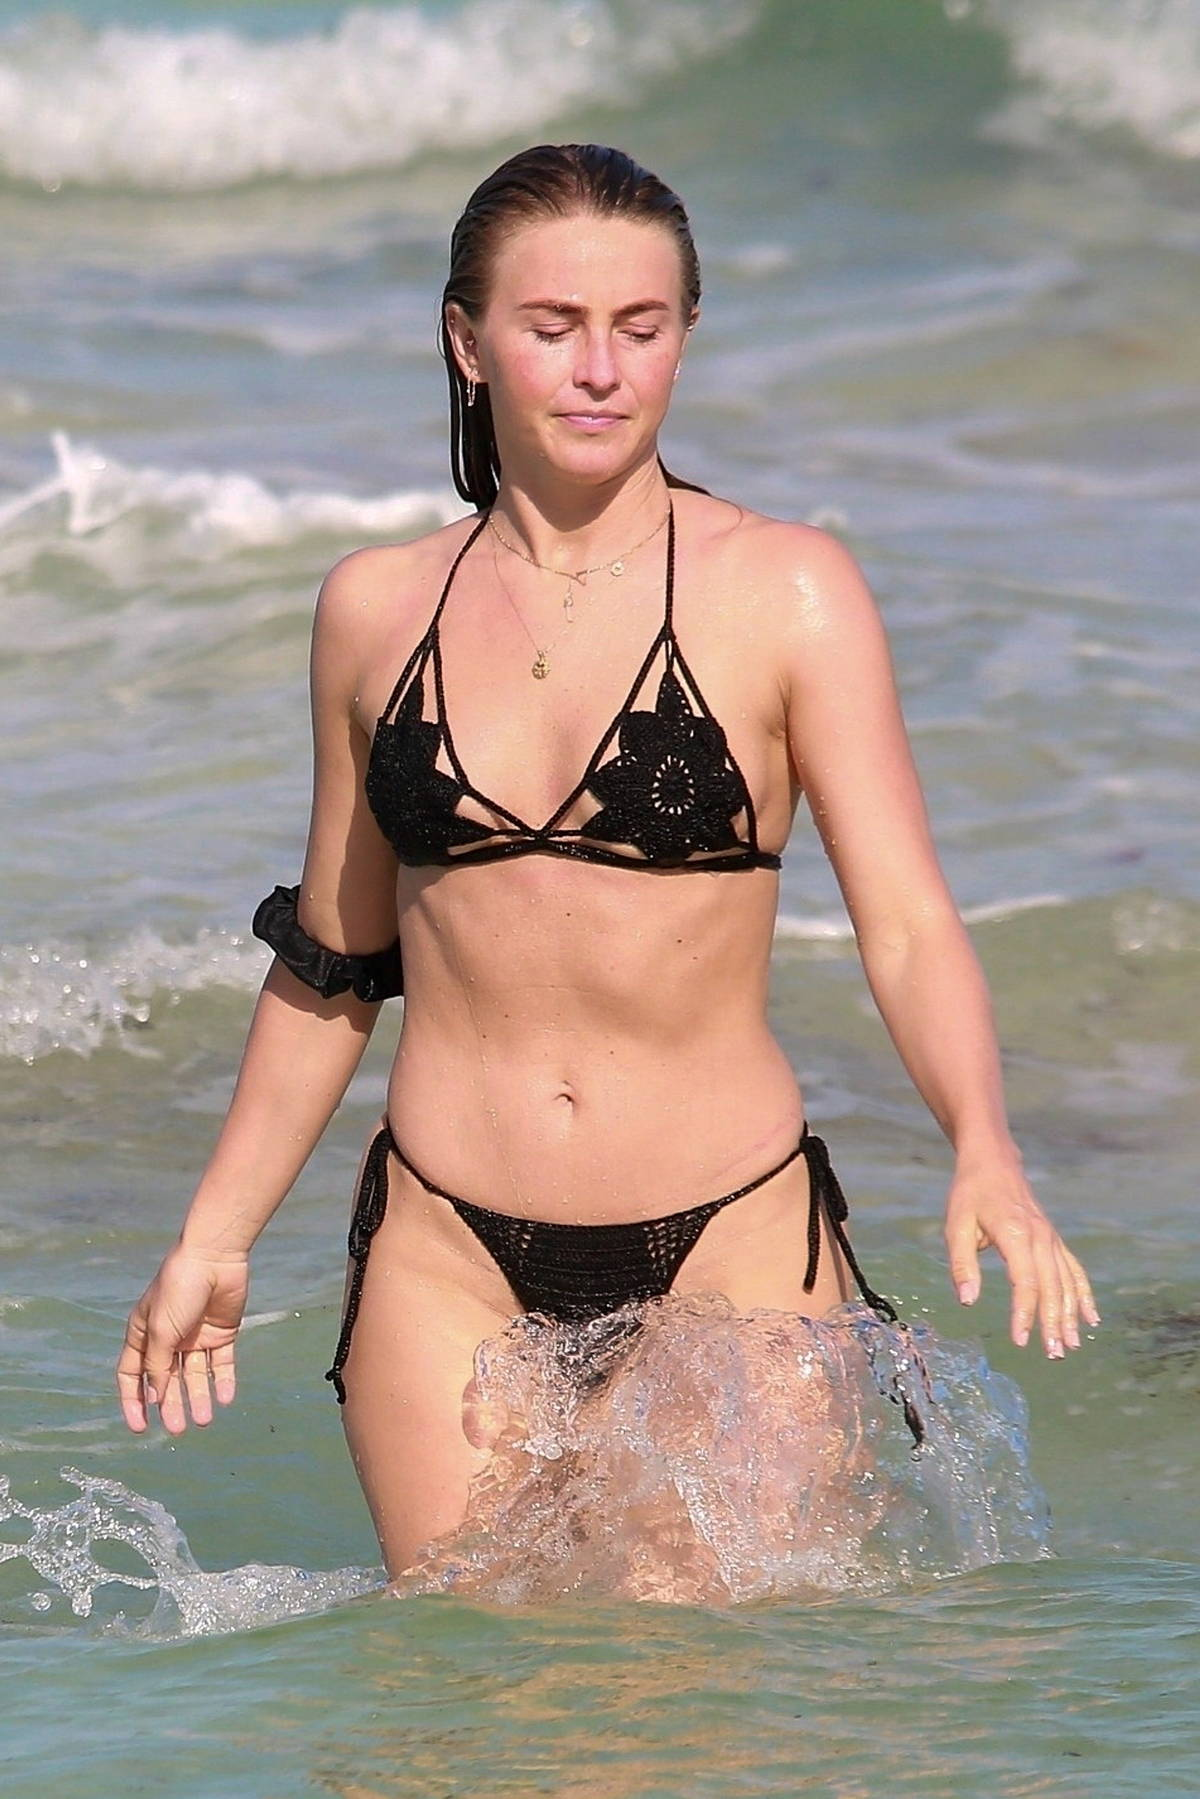 Julianne Hough stuns in a black crochet bikini while enjoying a beach day with friends in Tulum, Mexico